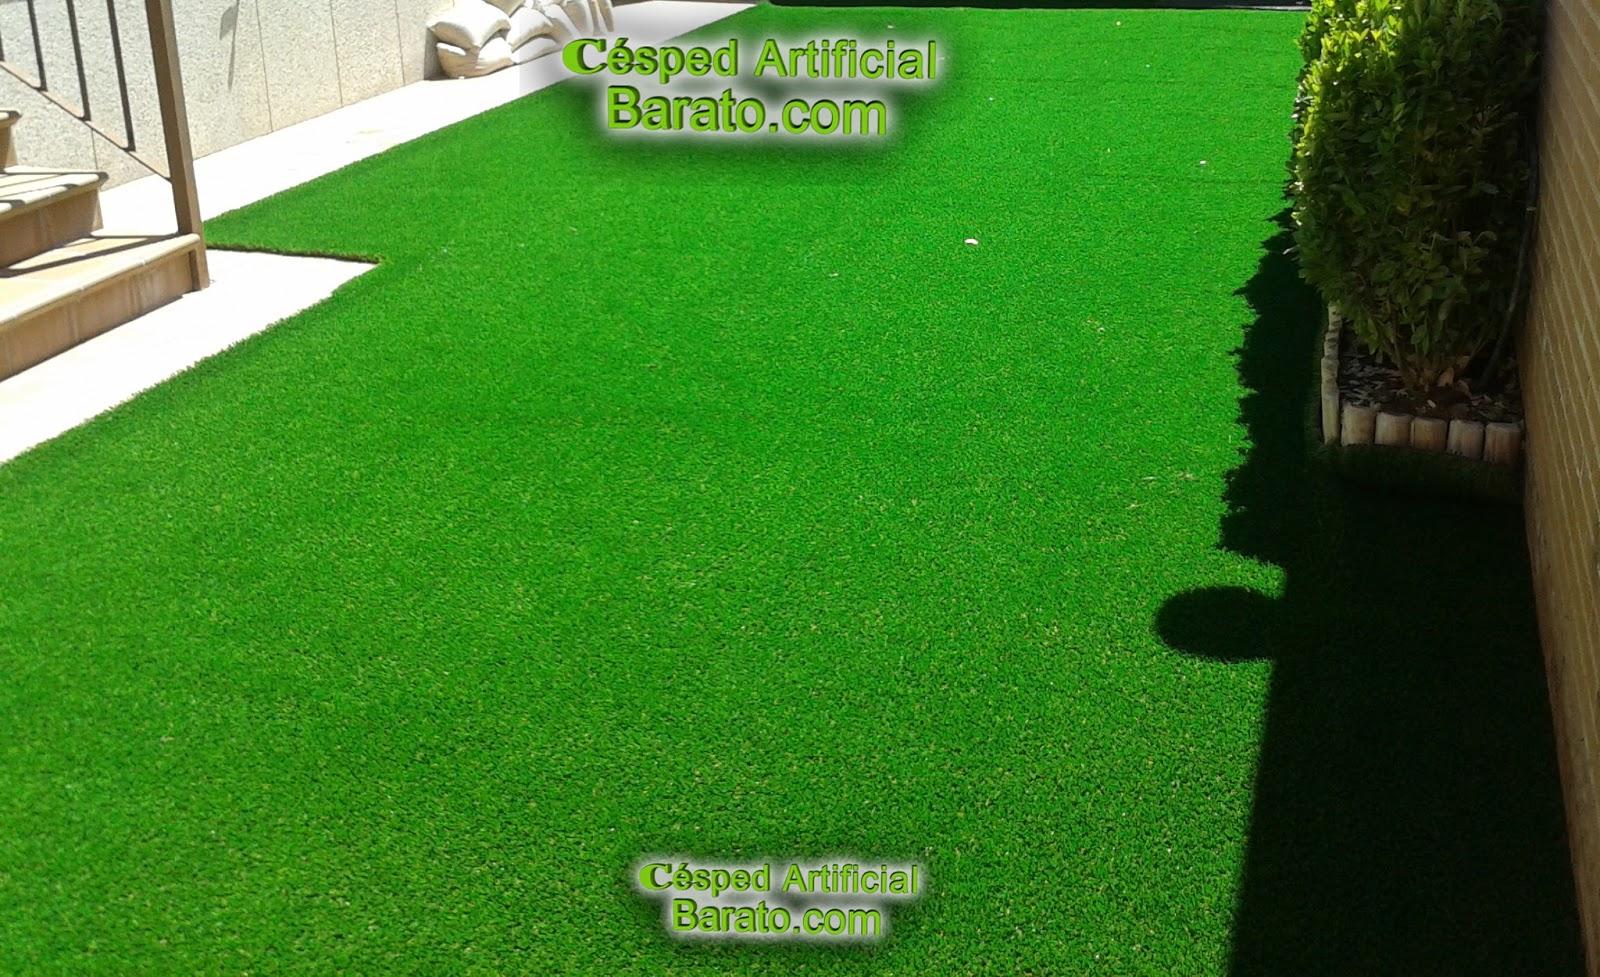 Ofertas c sped artificial barato c sped artificial jardines fibra concava - Jardin vertical artificial barato ...